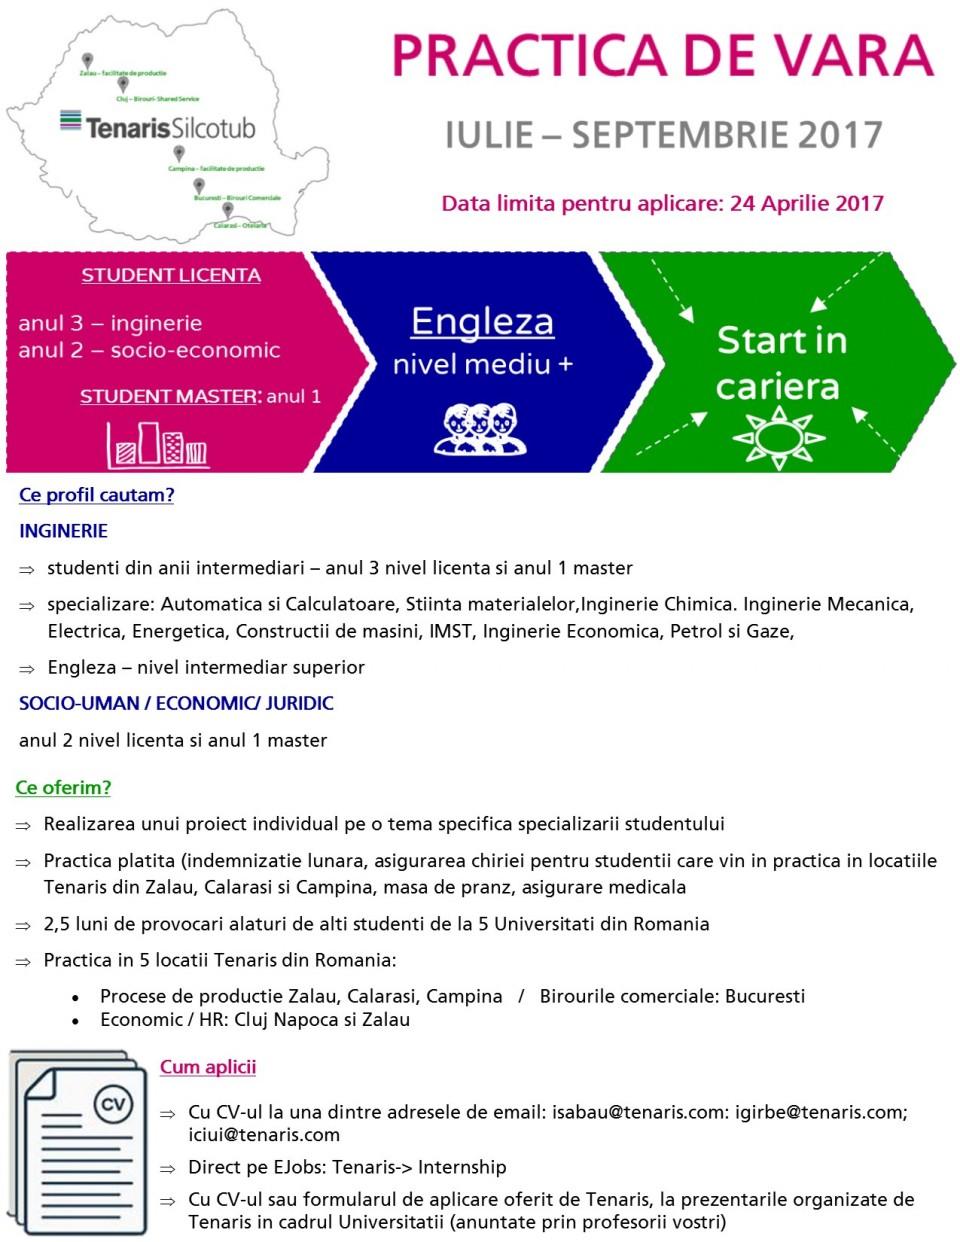 Summer Internship 2017: Zalau, Calarasi, Campina, Bucuresti, Cluj-Napoca